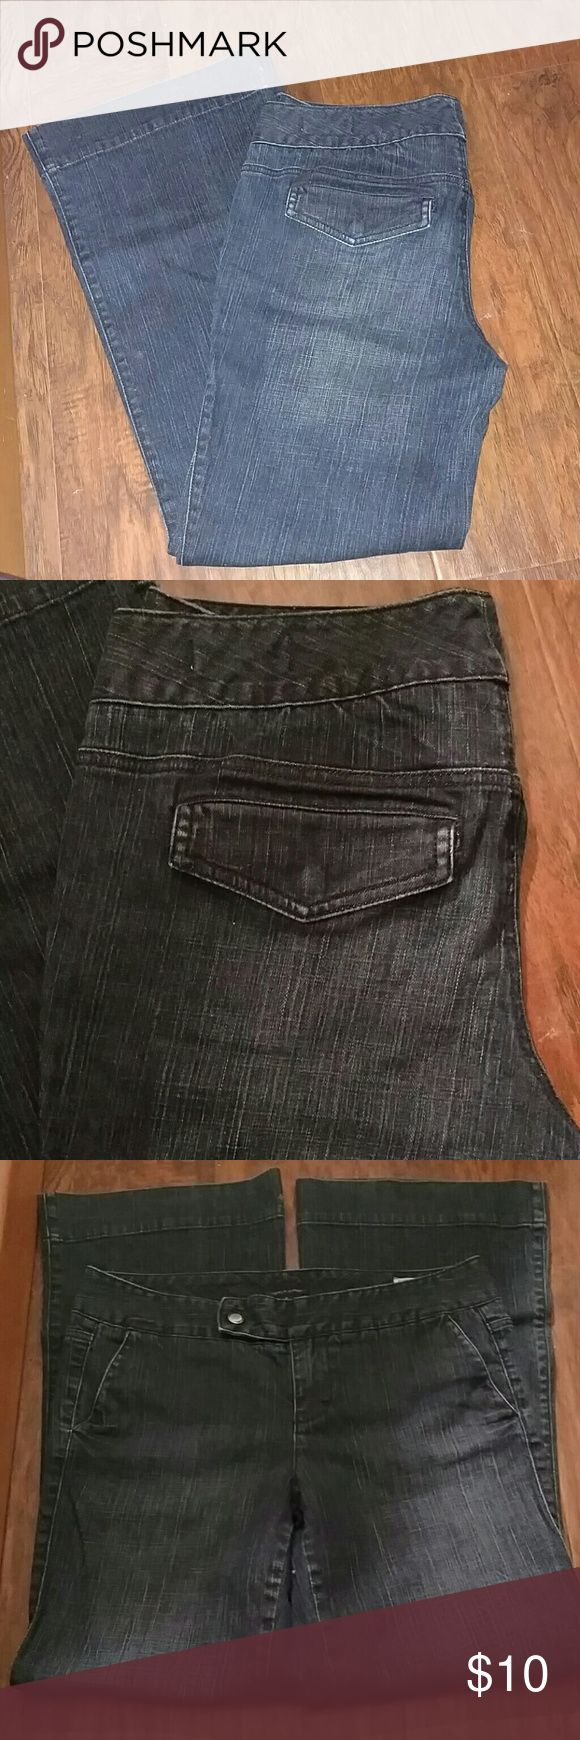 TOMMY HILFIGER AMERICAN SPLENDOR JEANS Design as Shown Excellent Used Condition Slight Flare Snap Back Pockets Darker Wash Tommy Hilfiger Jeans Flare & Wide Leg